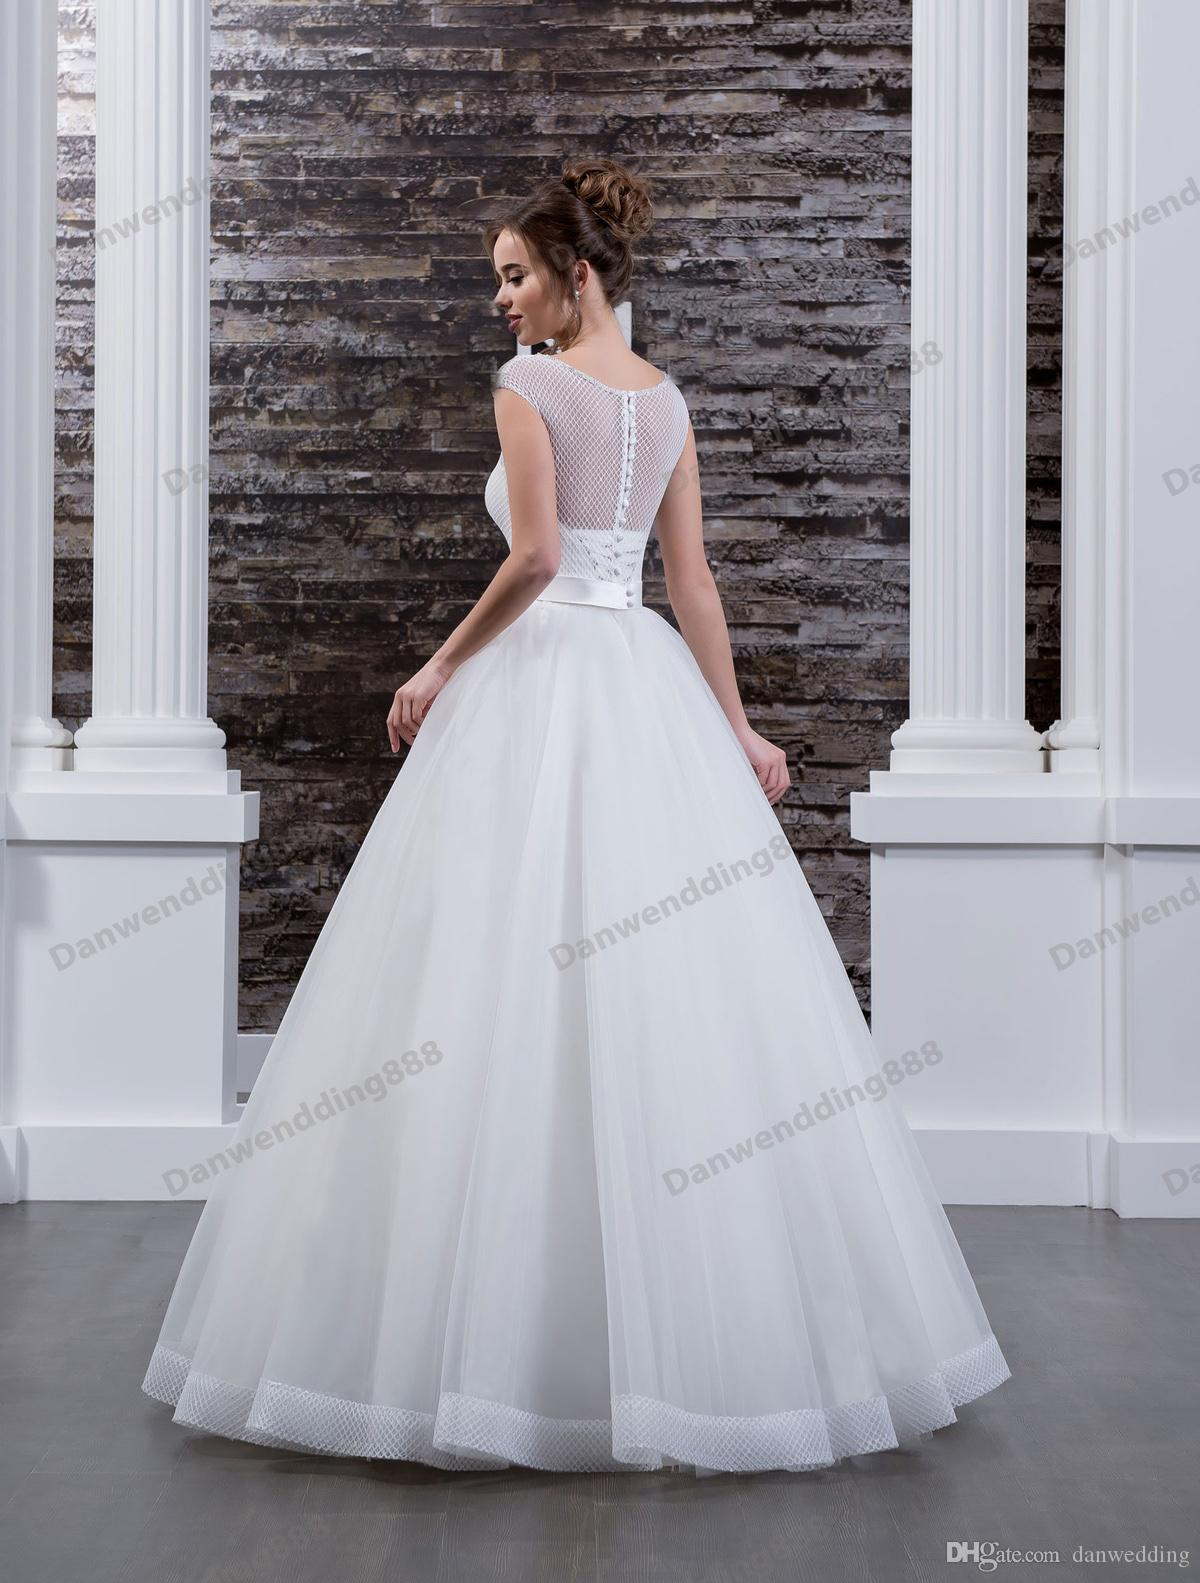 Beauty White Tulle/Lace Scoop Applique Beads A-Line Wedding Dresses Bridal Pageant Dresses Wedding Attire Dresses Custom Size 2-16 ZW608088